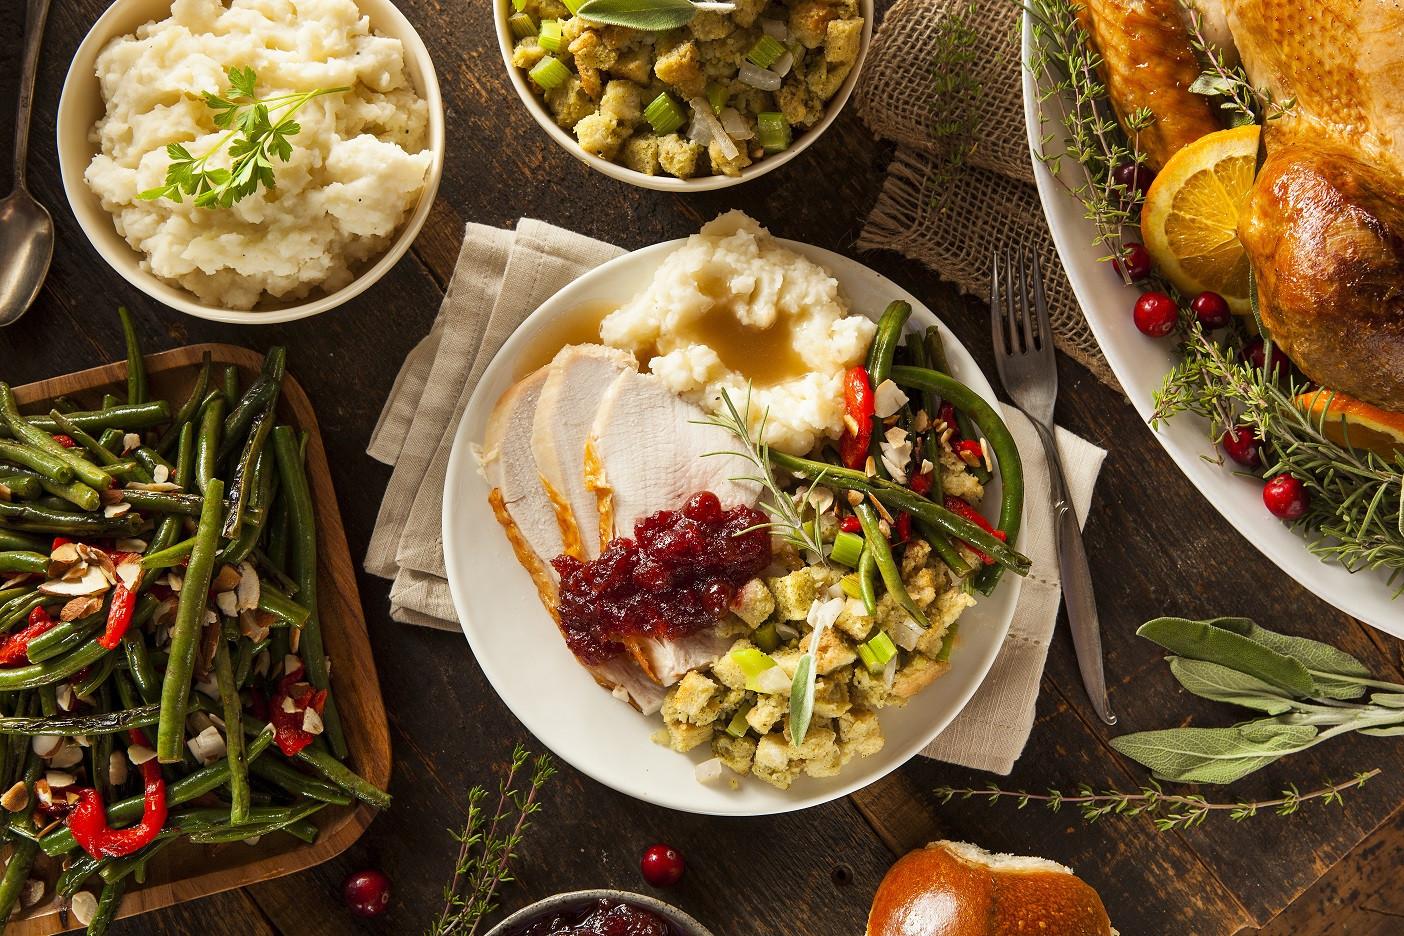 Thanksgiving Dinner Food  Thanksgiving Dinner Traditions in Ocean City MD